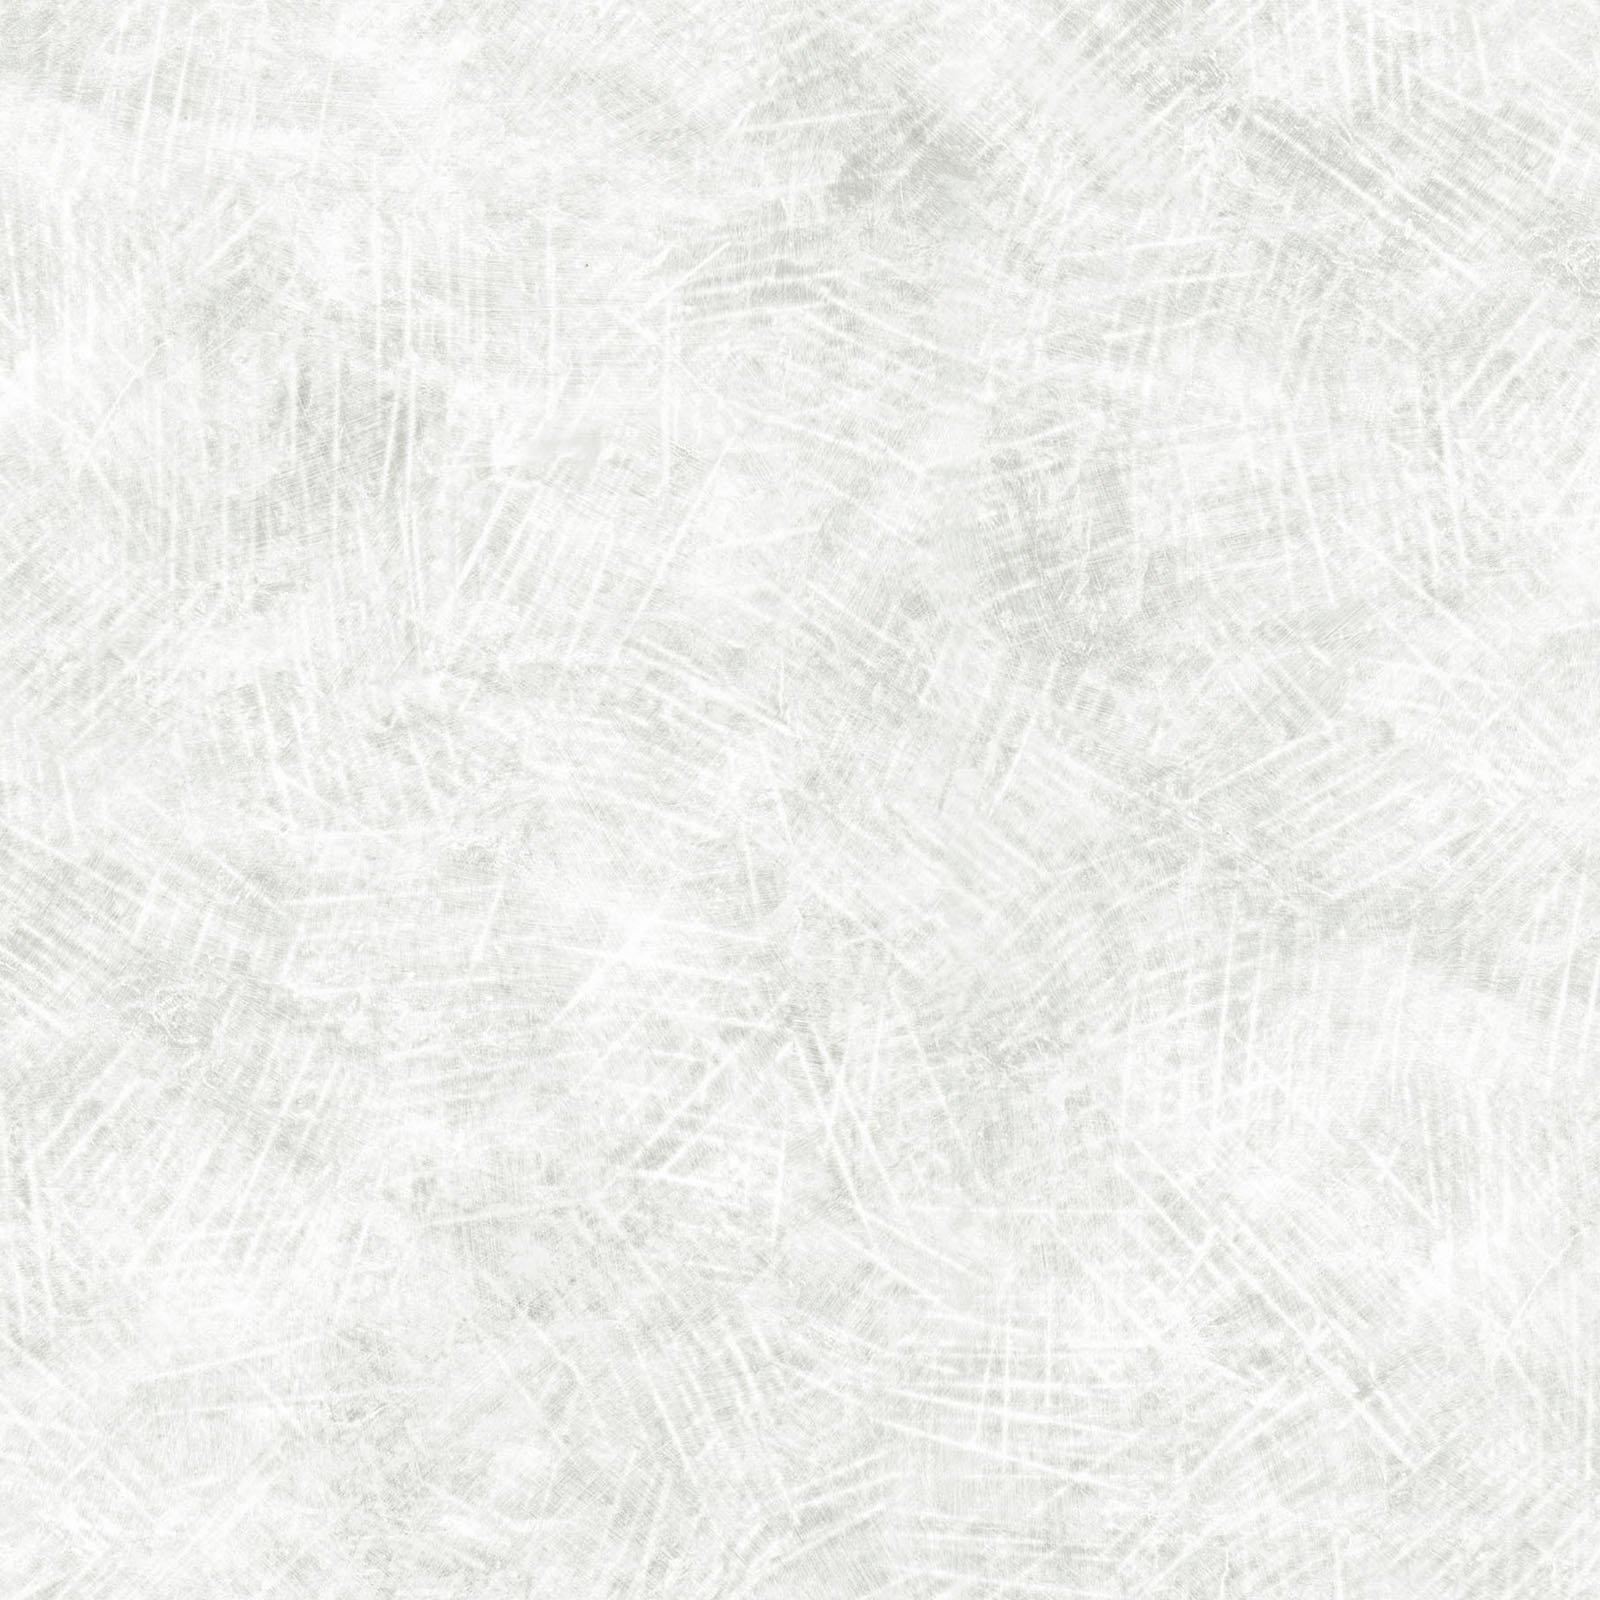 KASK-4098 LS - KASHMIR KALEIDOSCOPE BY P&B BOUTIQUE TEXTURE LT GRY